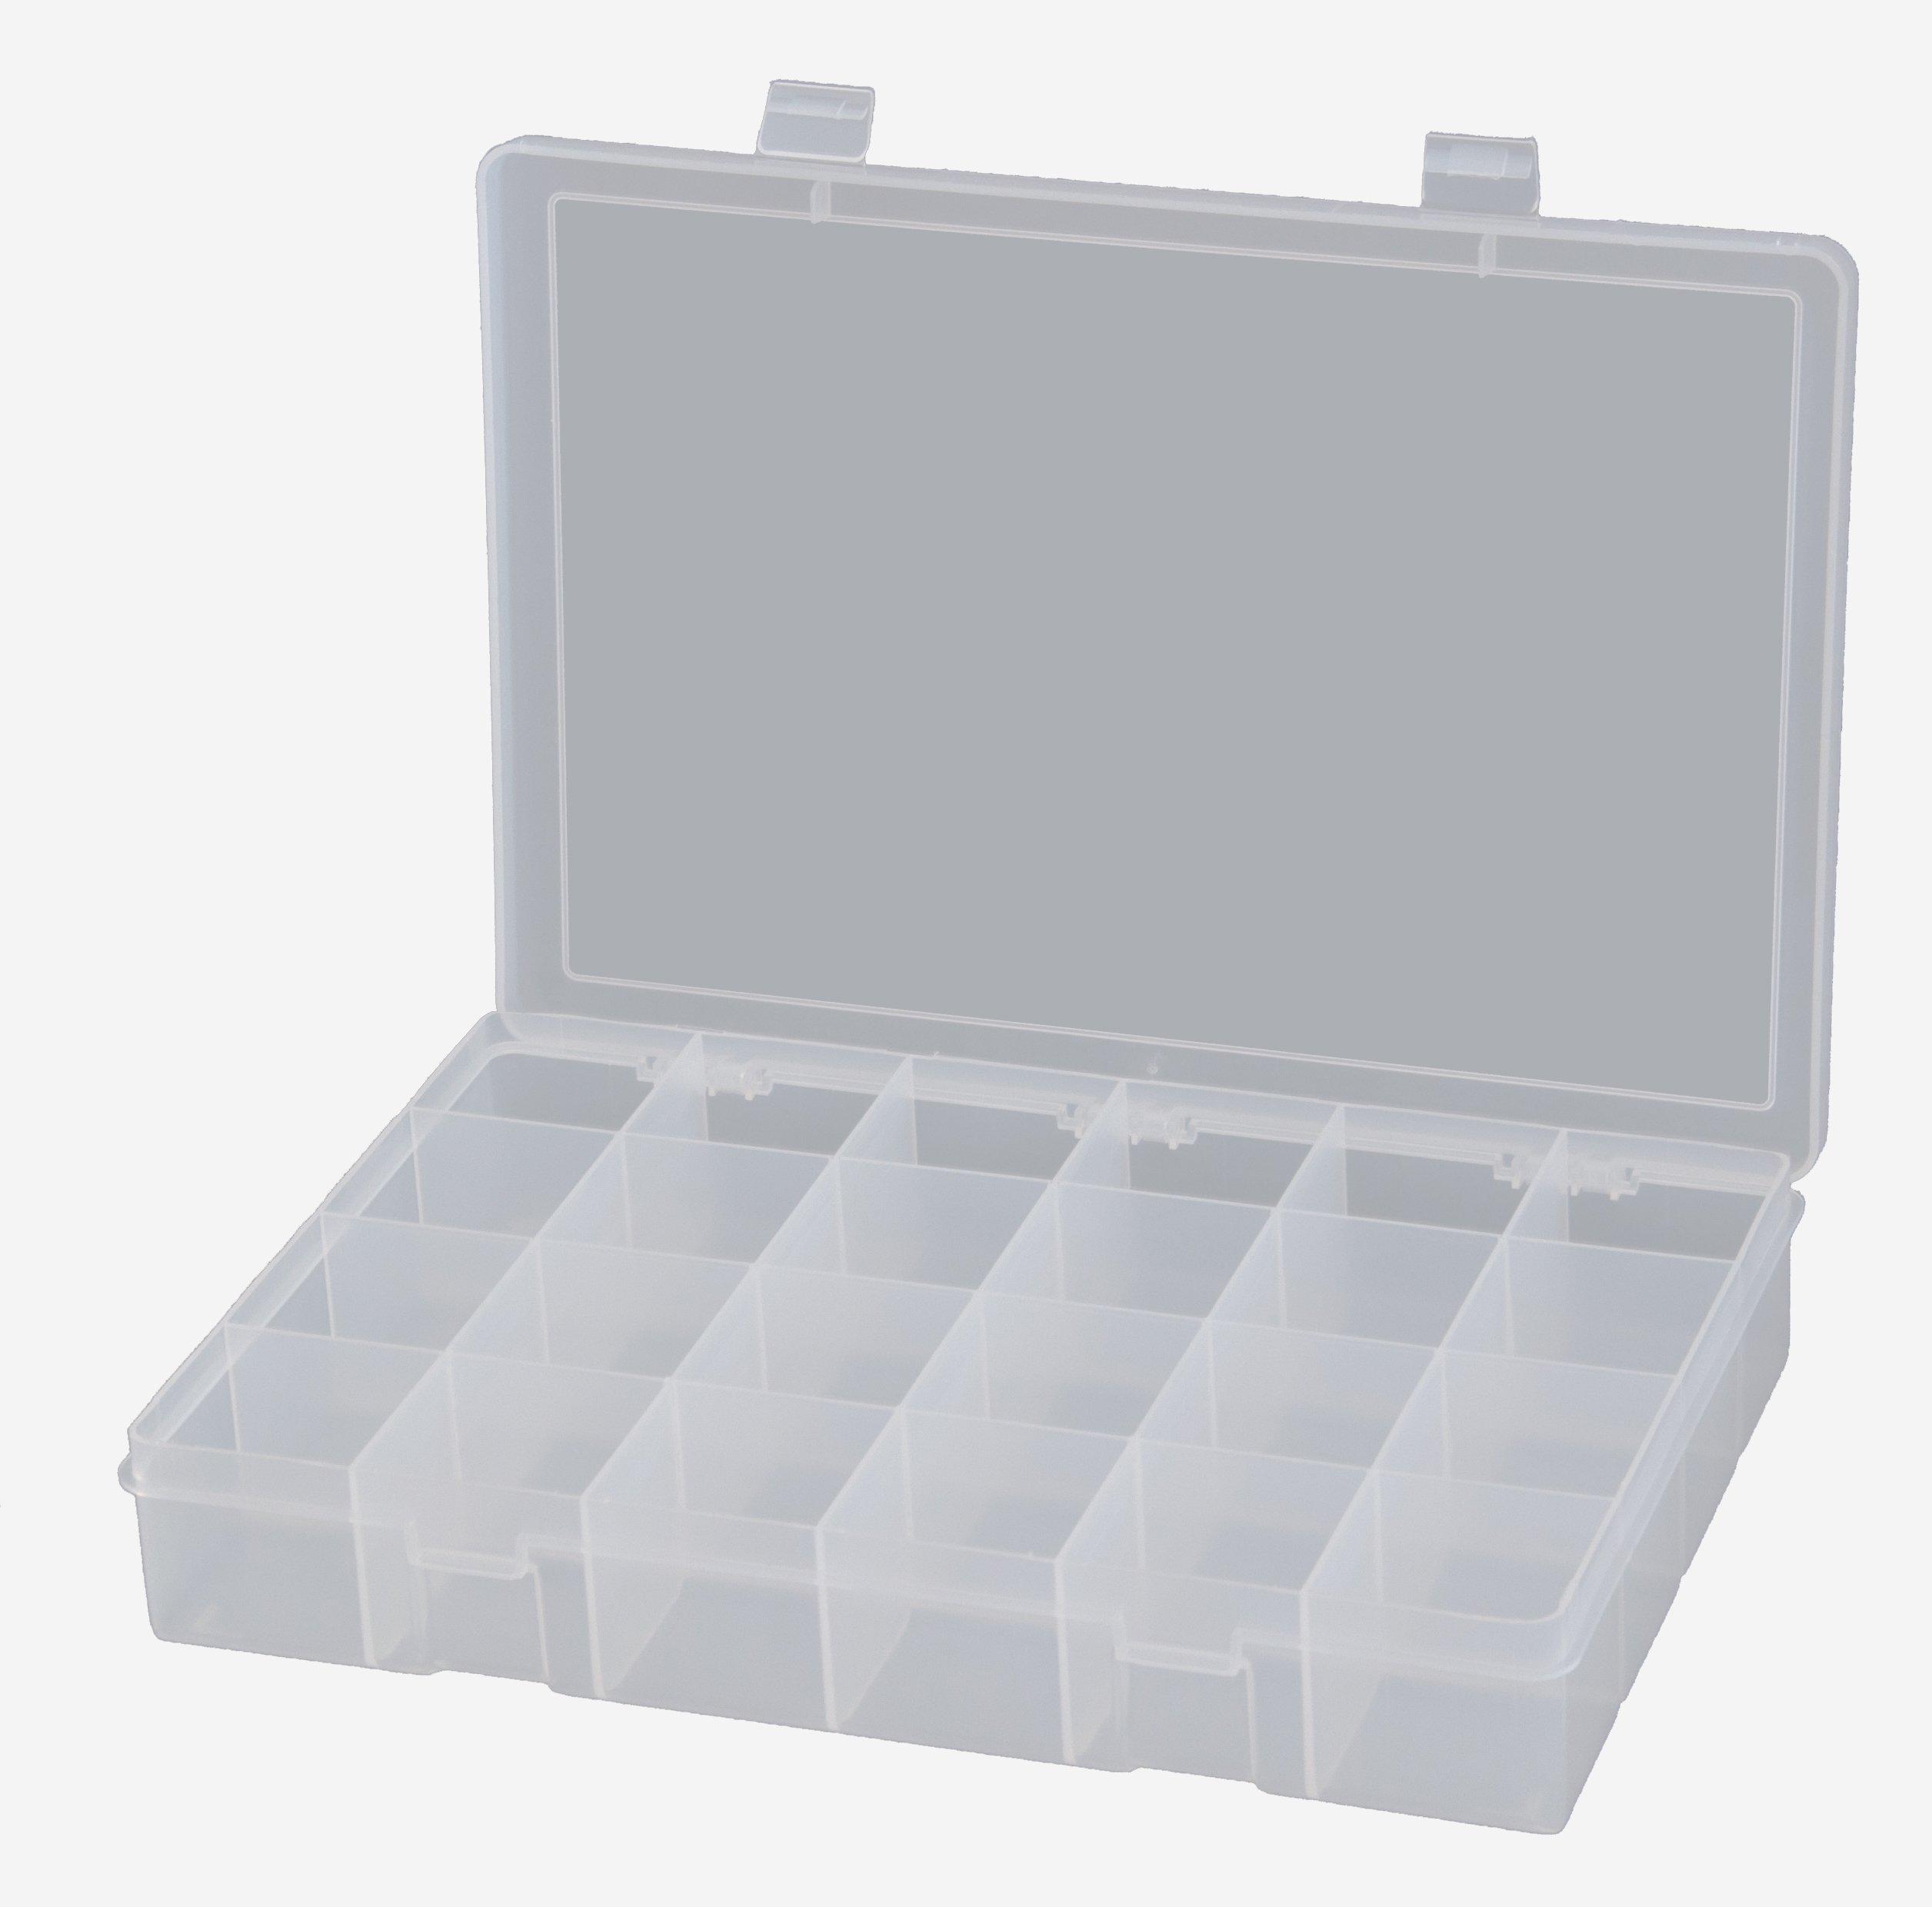 Durham LP24-CLR Polypropylene Large Box, 24 Compartment, 9'' Length x 13-1/8'' Width x 2-5/16'' Height, Clear by Durham